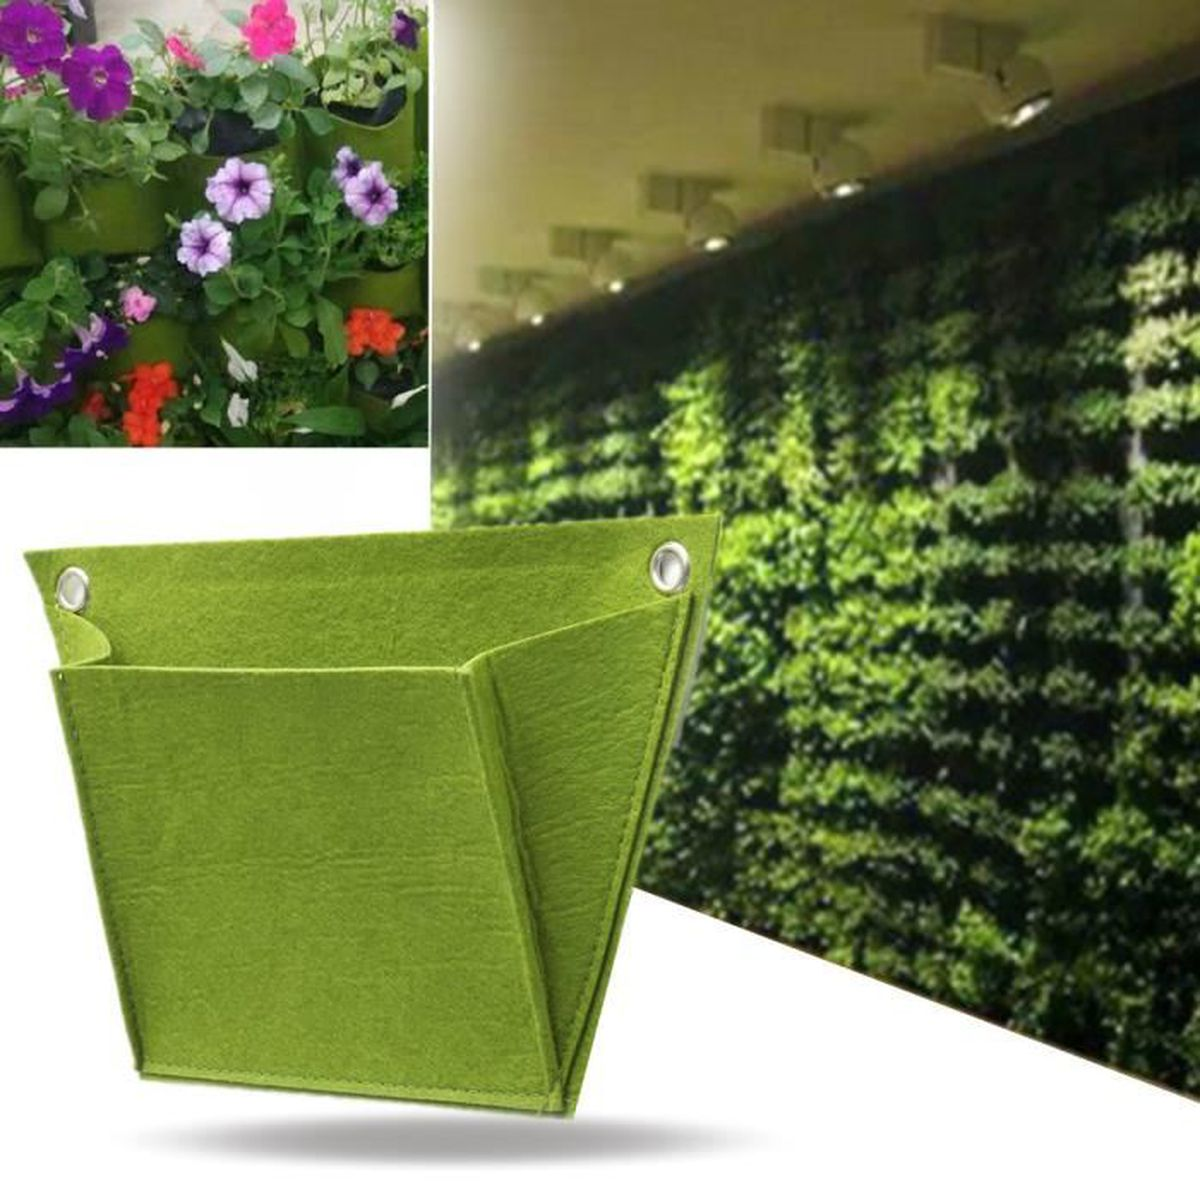 Sac de plantation v g tal mural suspendu fleur herbe for Achat plante jardin